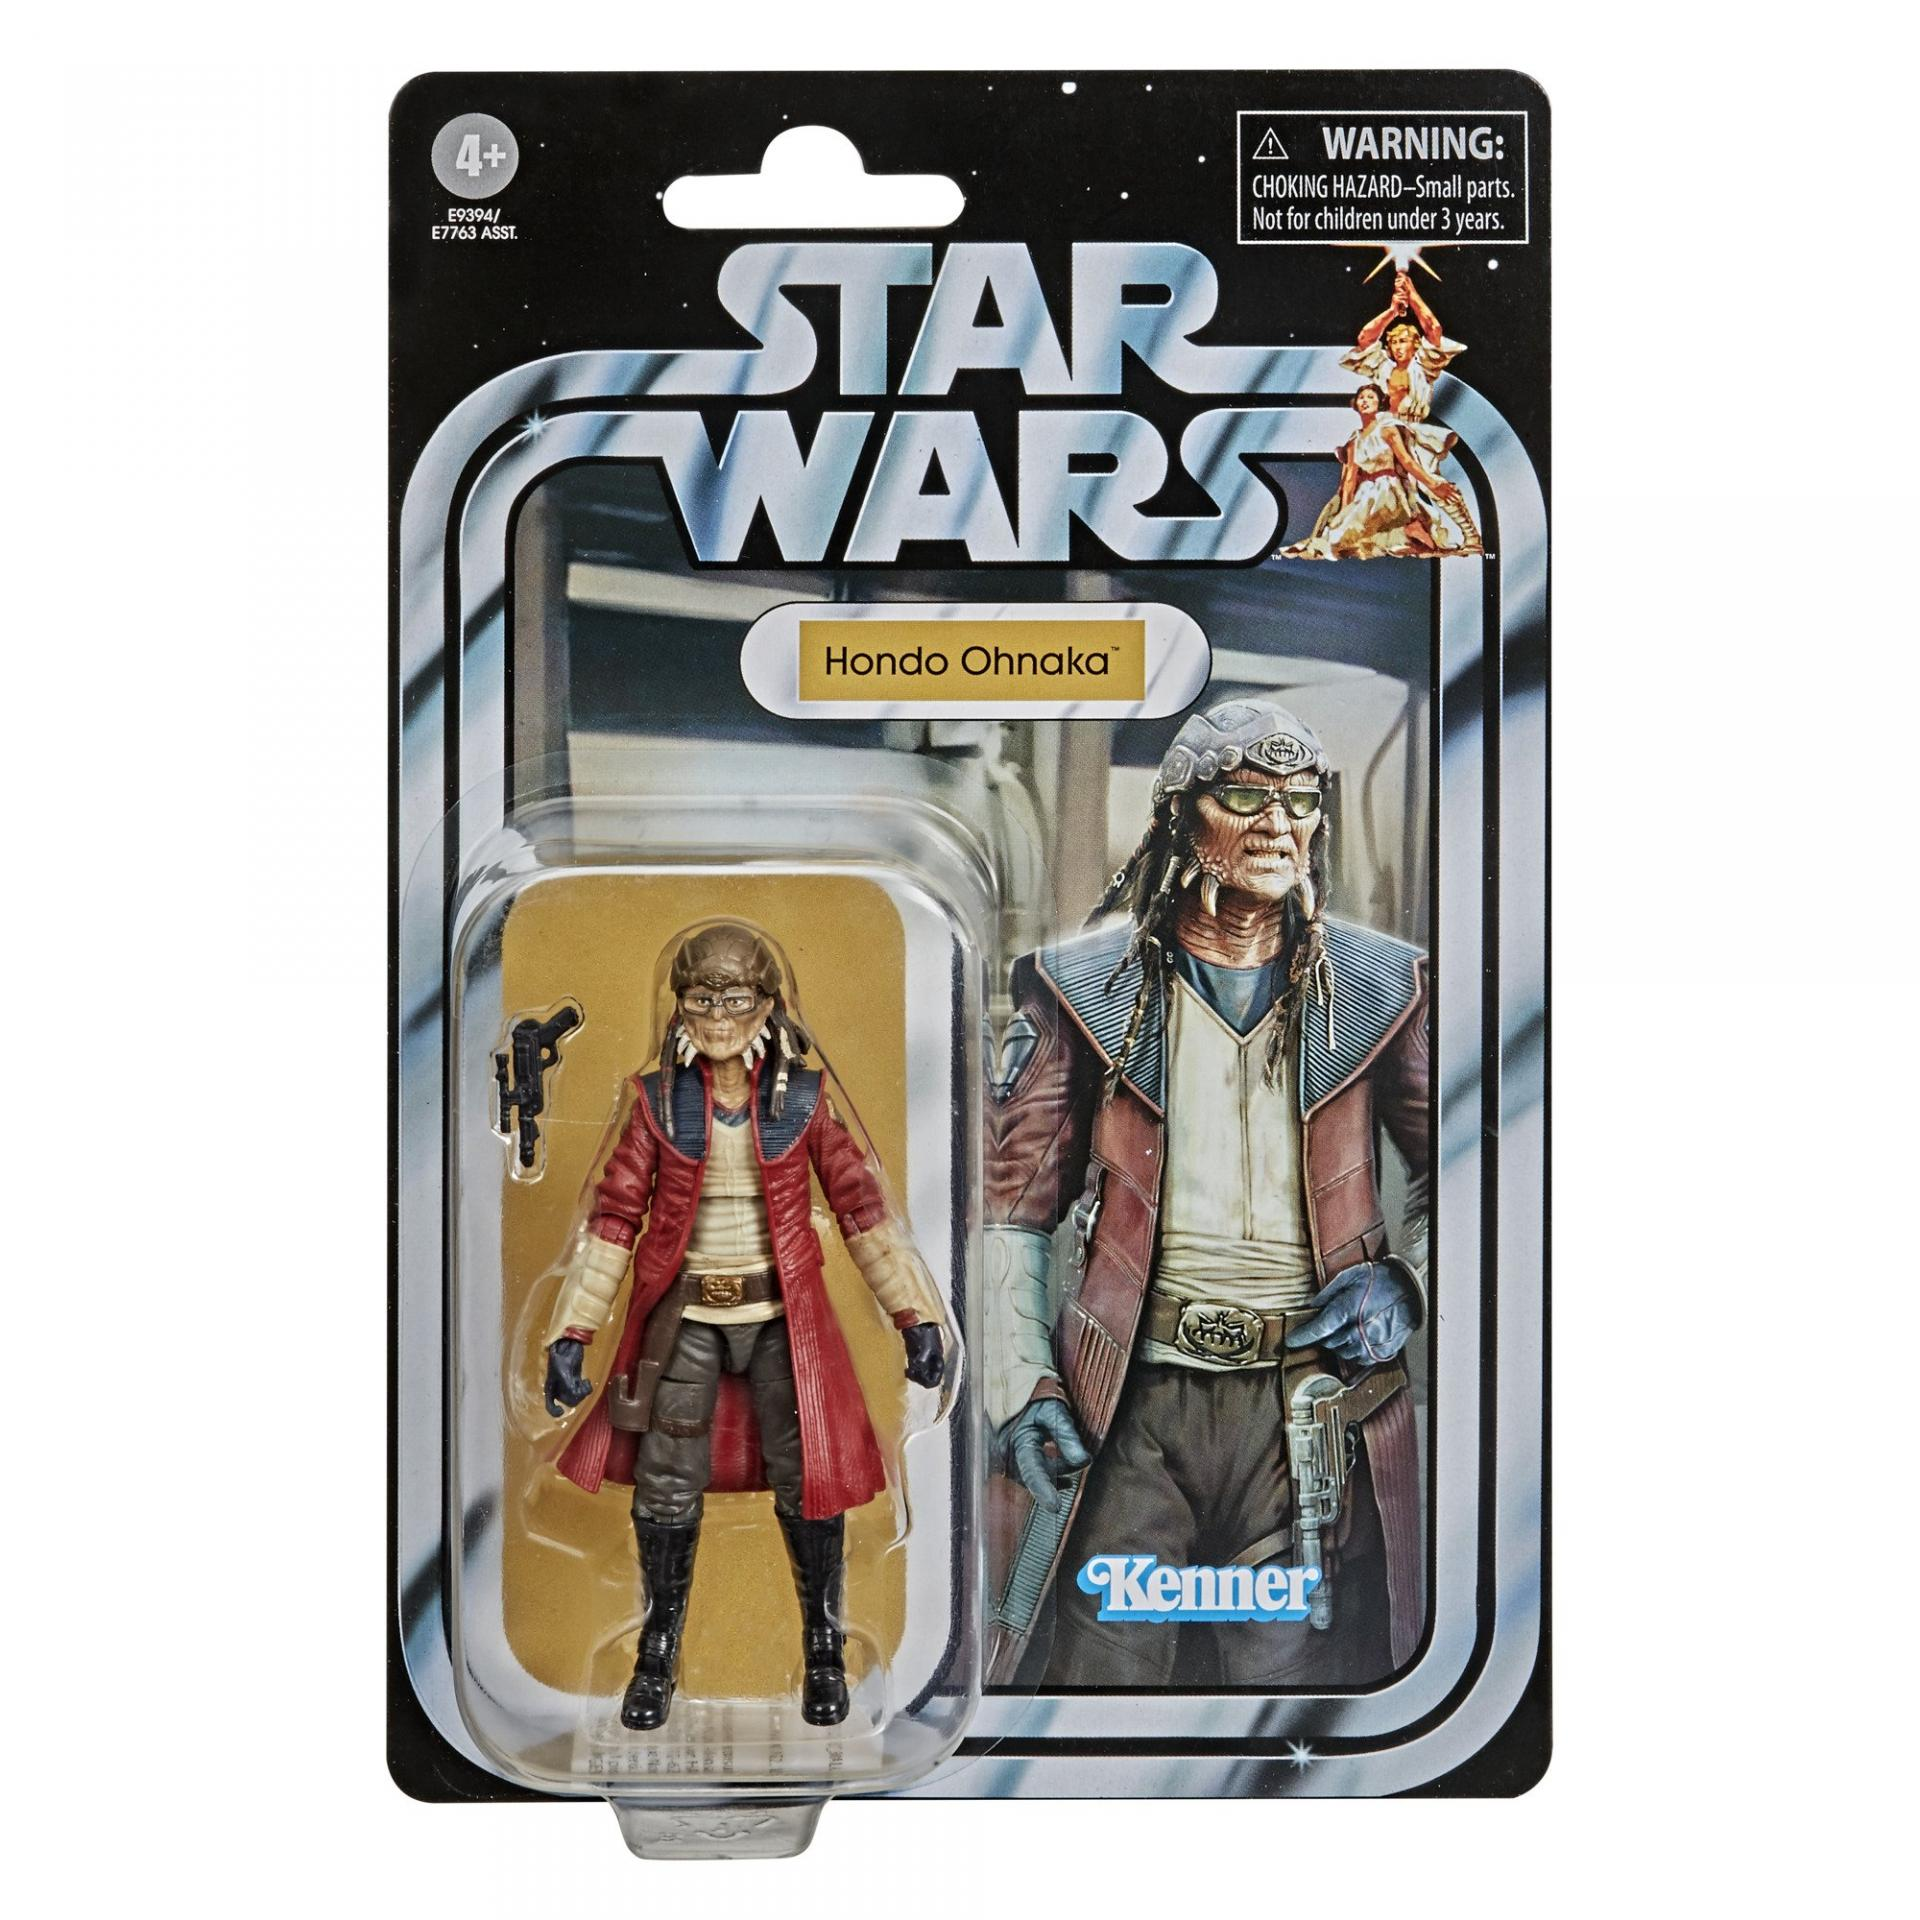 Star wars the vintage collection hondo ohnaka